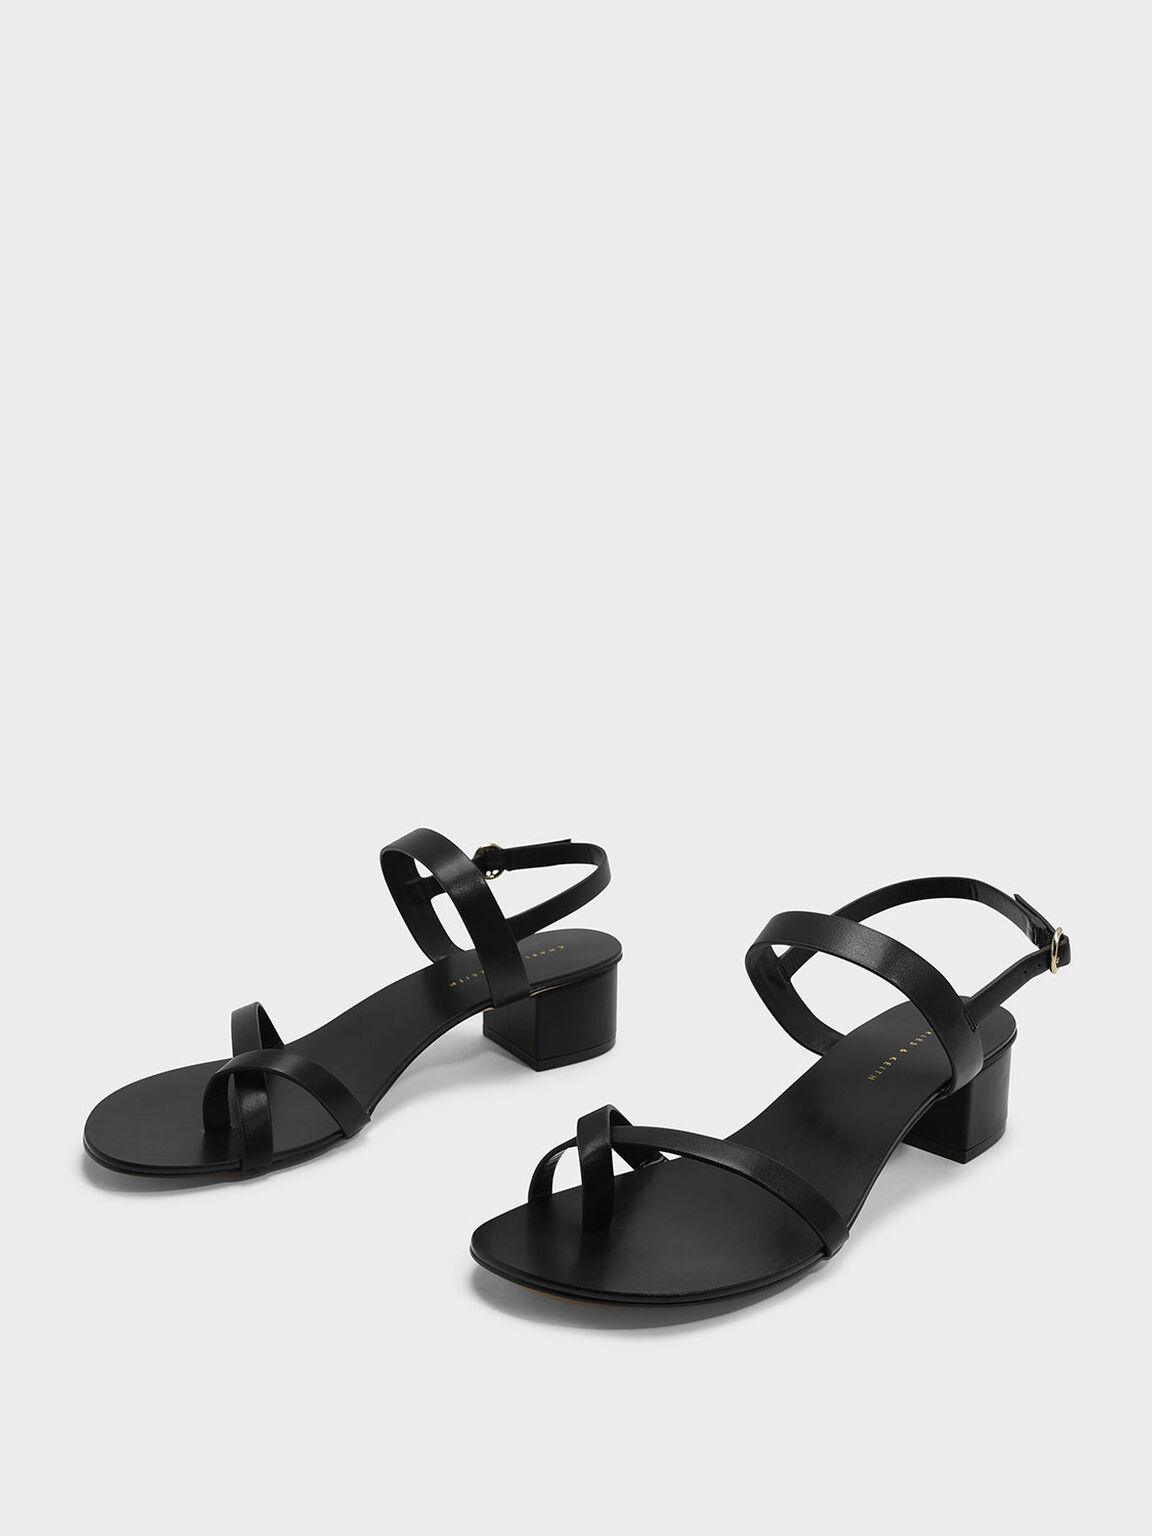 Crossover Toe Strap Sandals, Black, hi-res